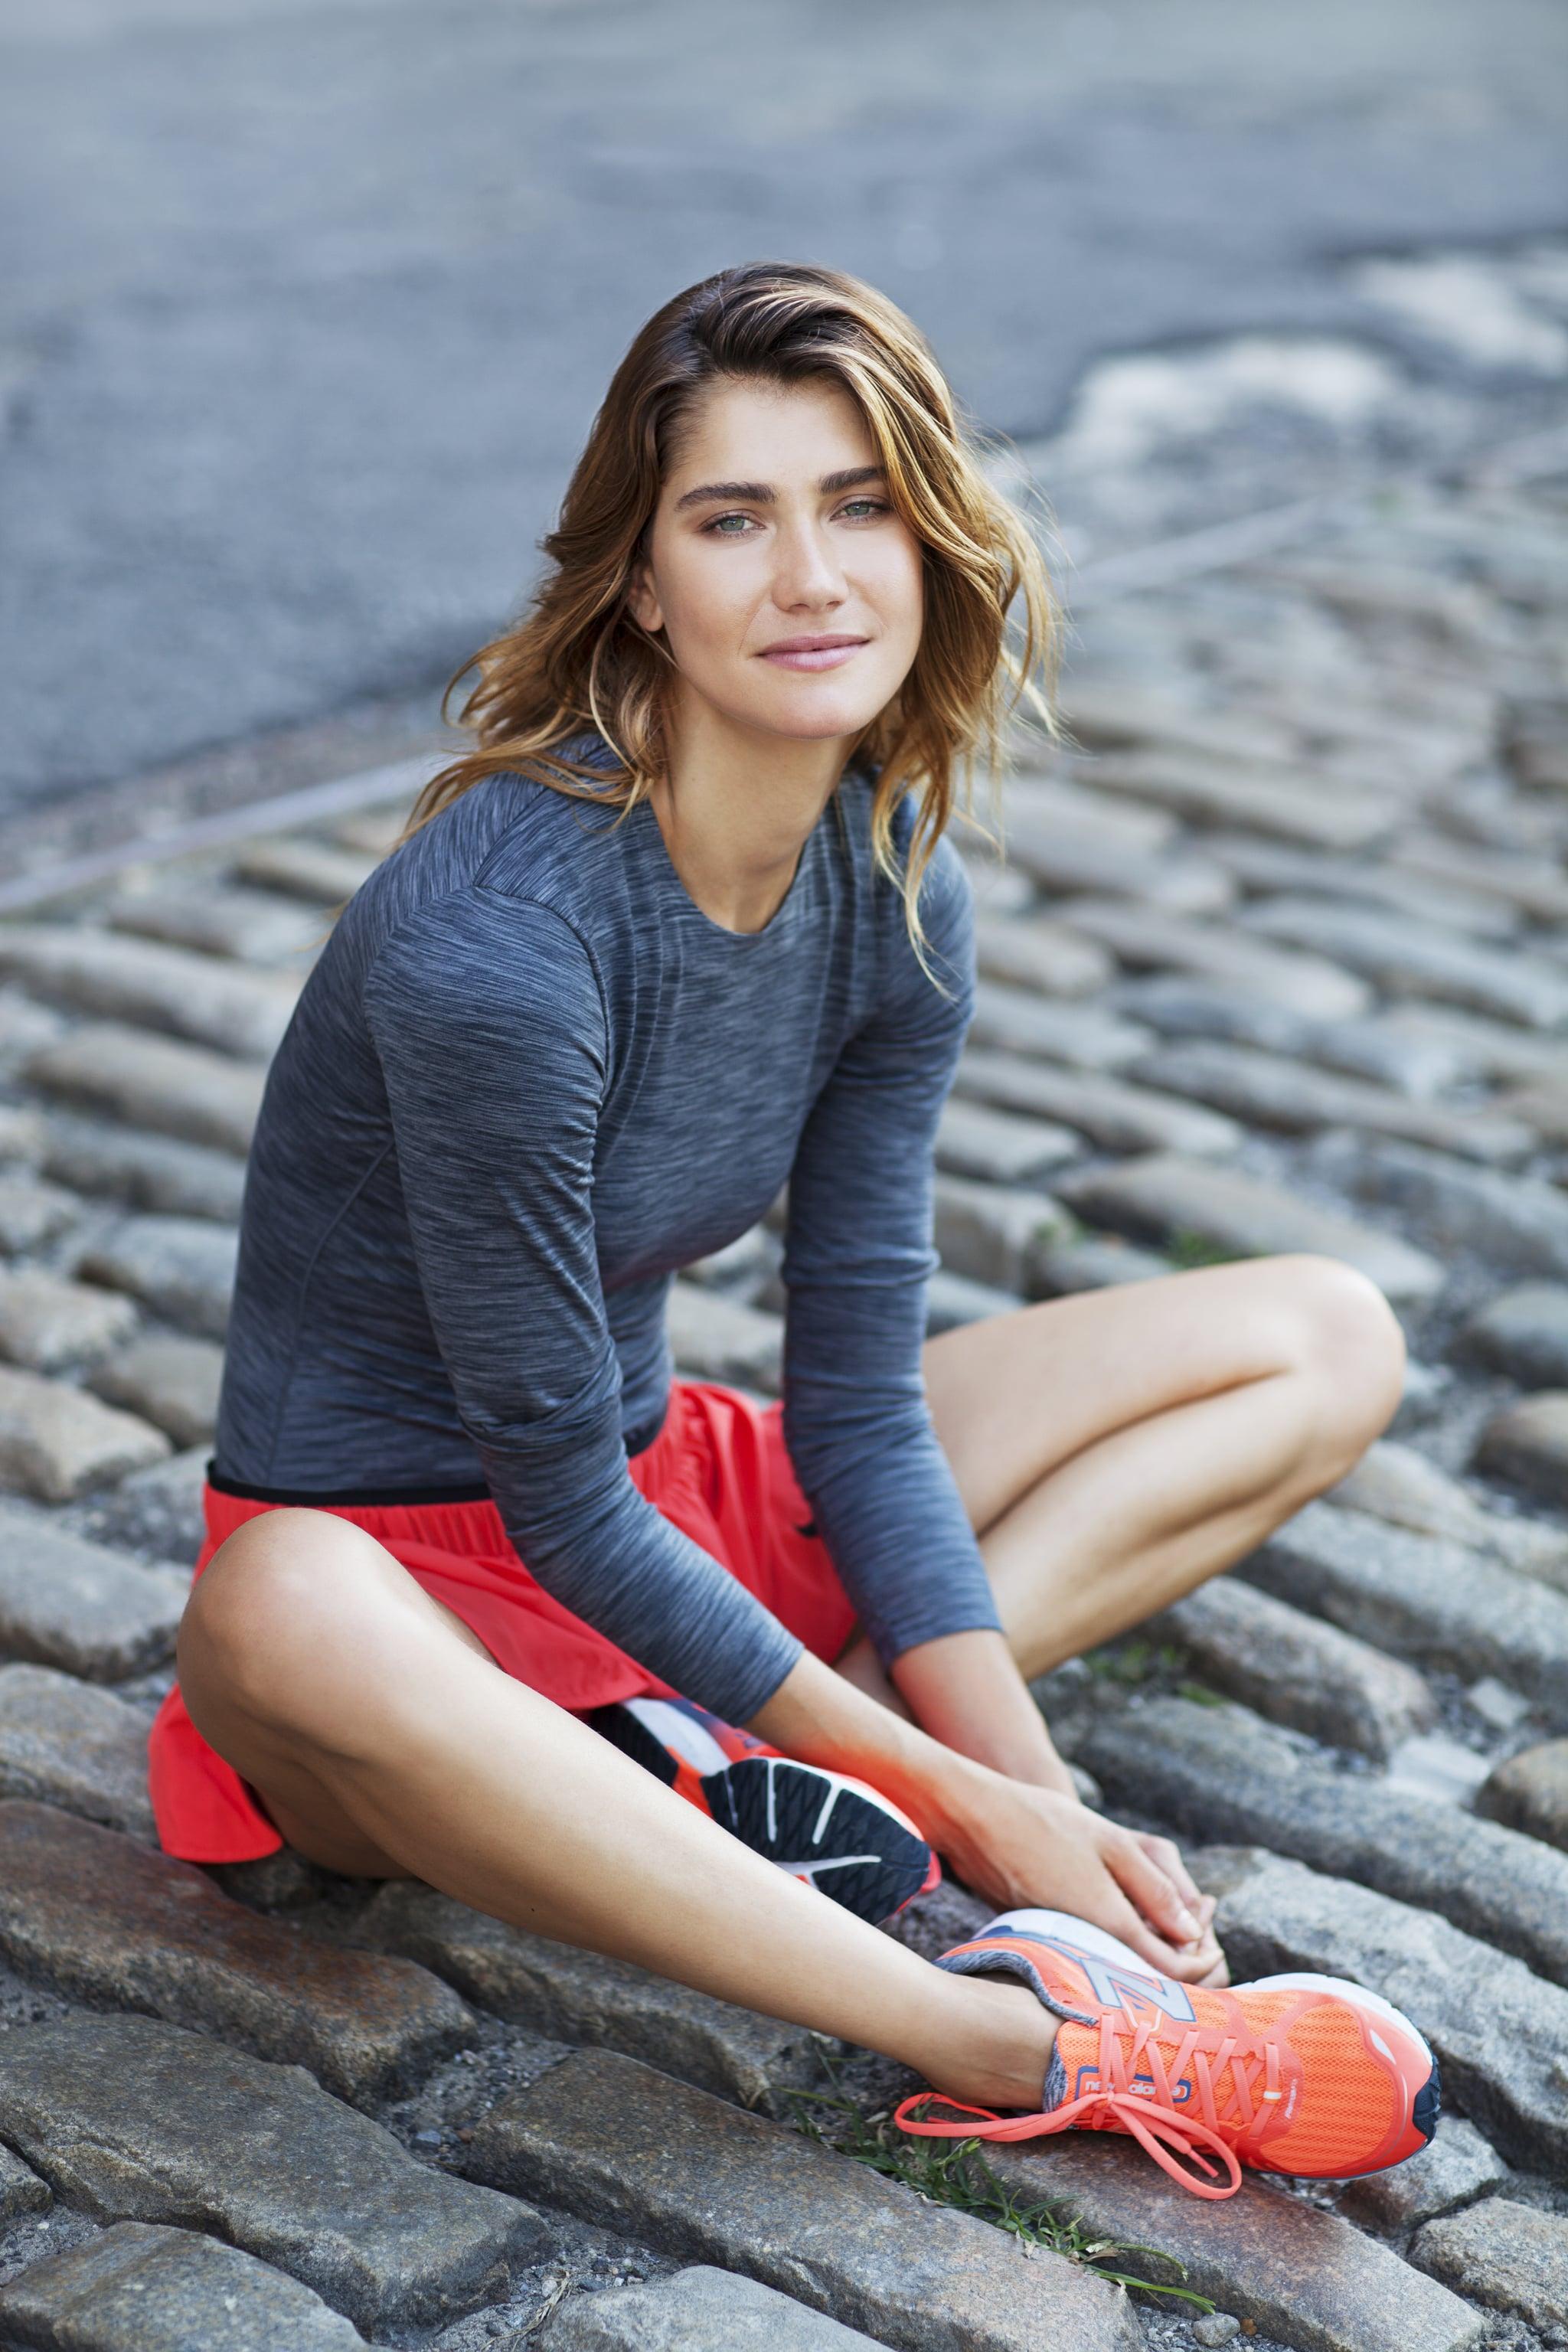 Trainer Jeanette Jenkins's Body-Positive Motivational